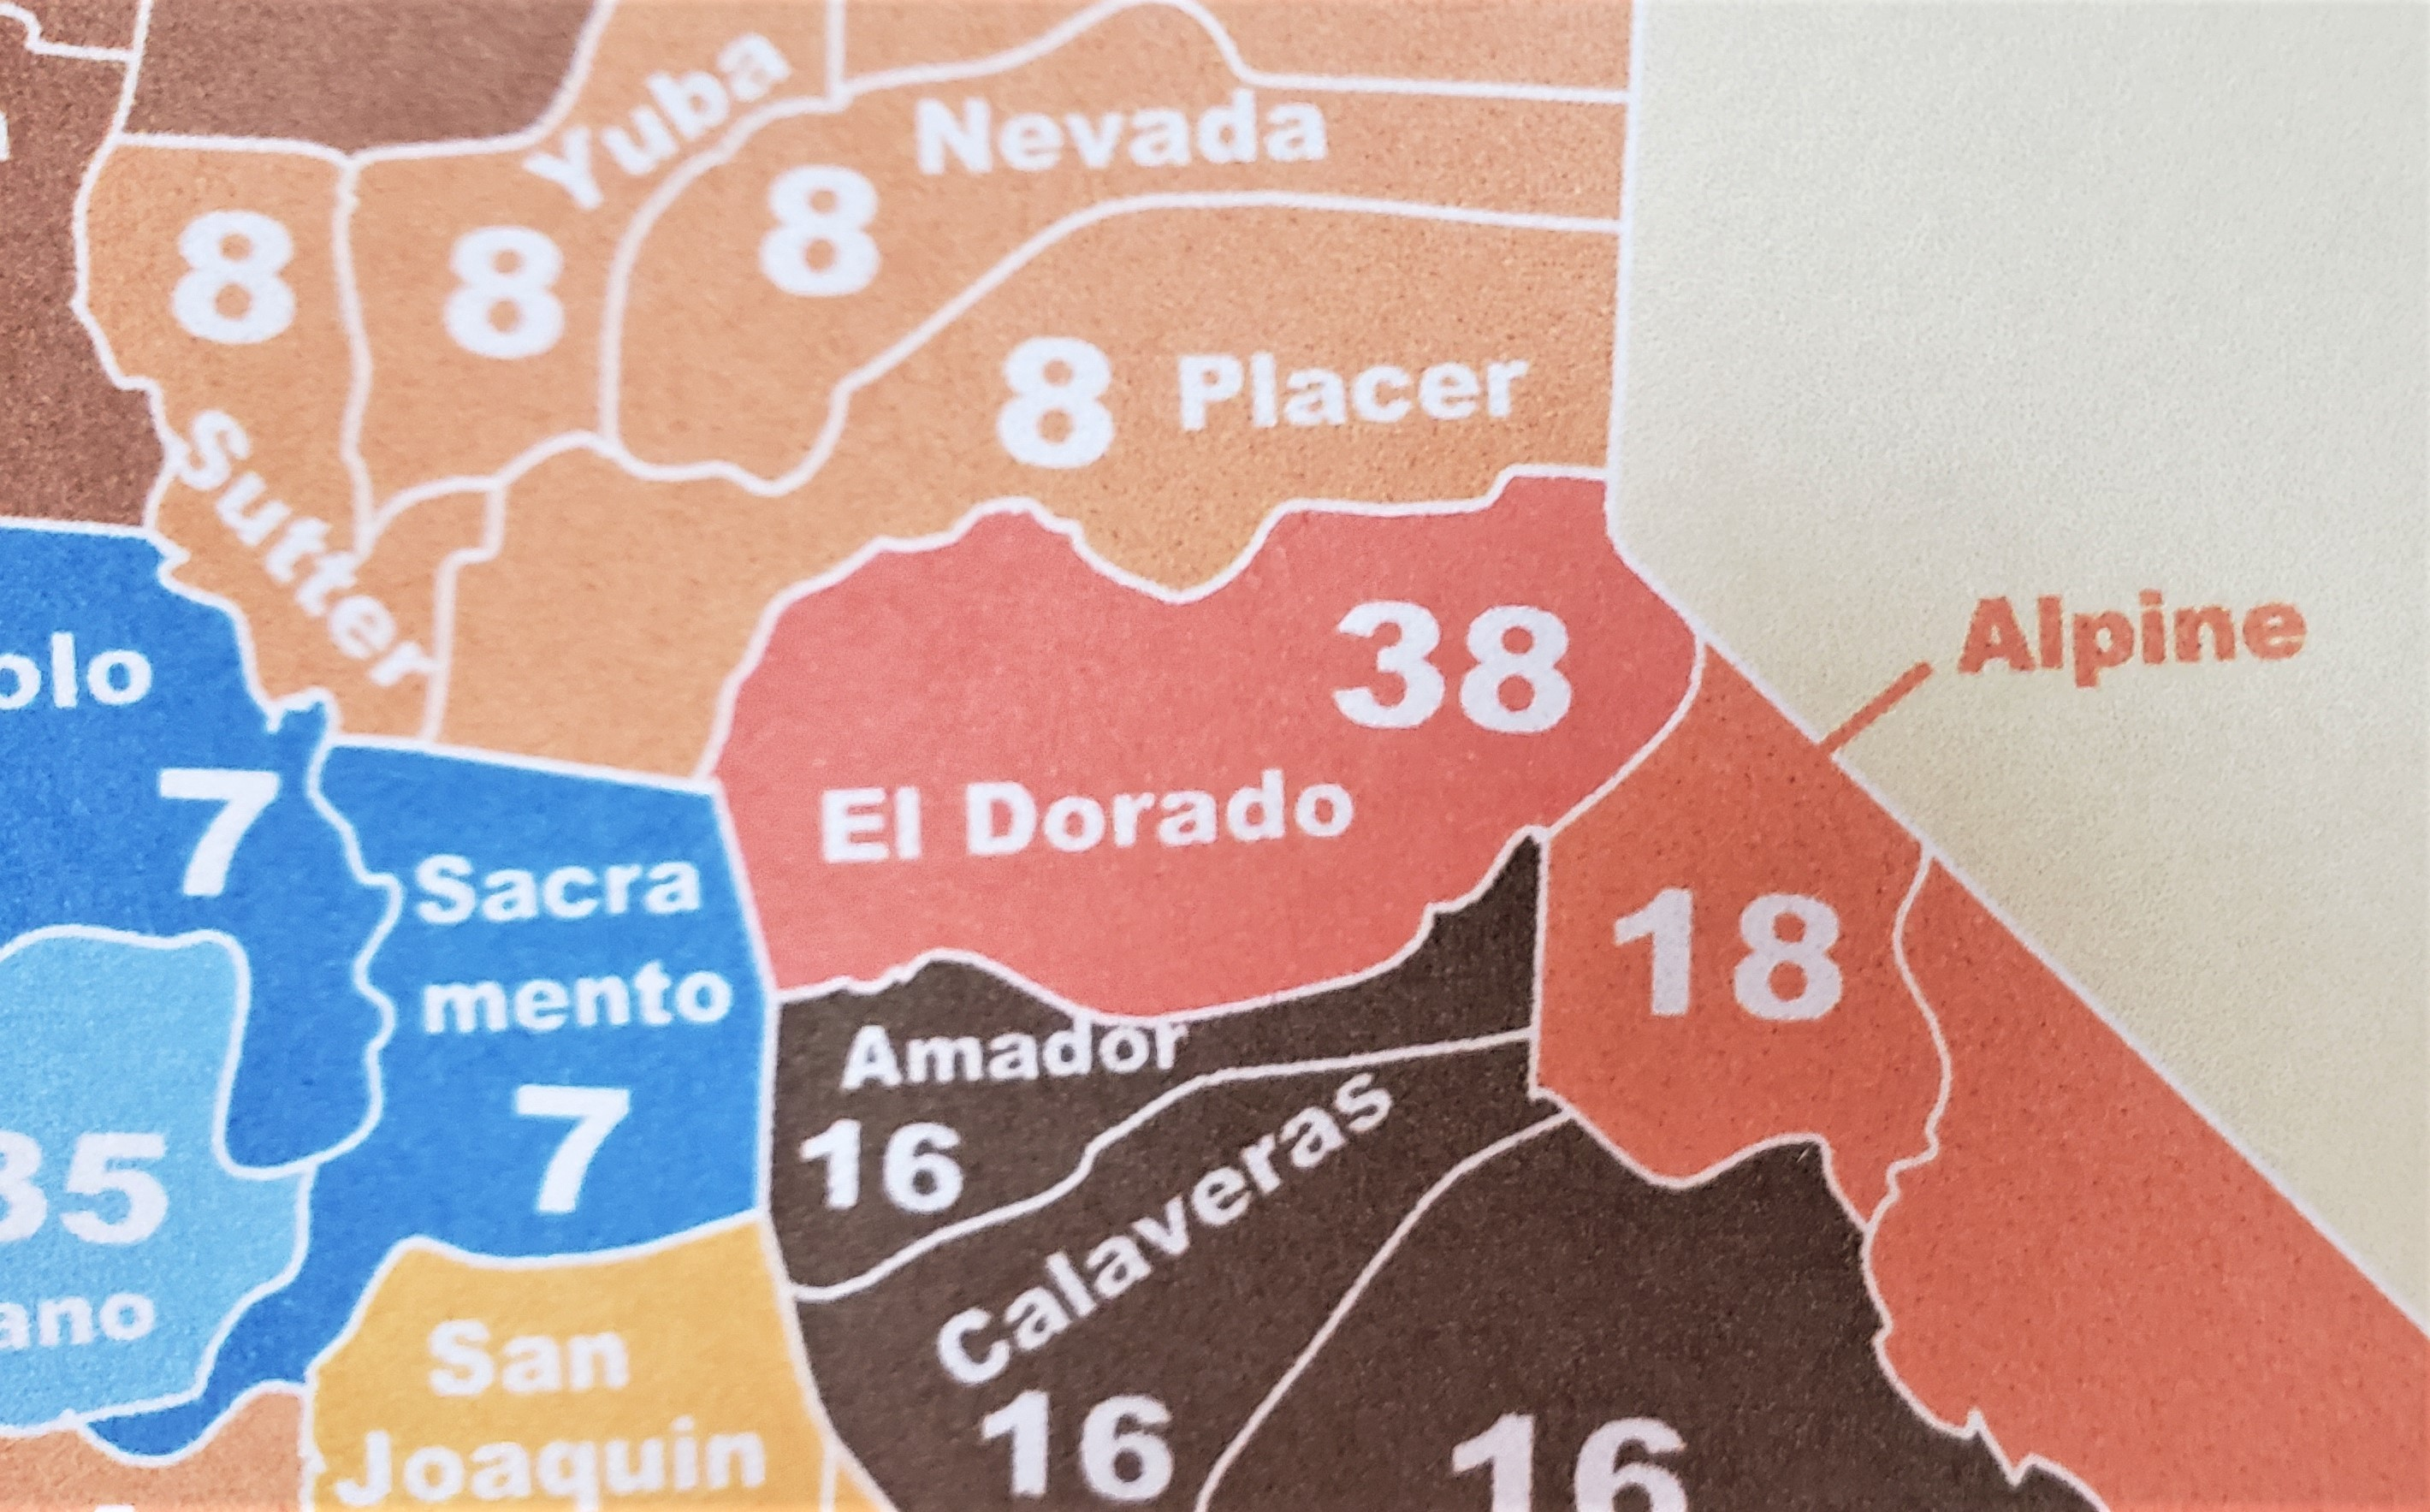 Region 38 Map